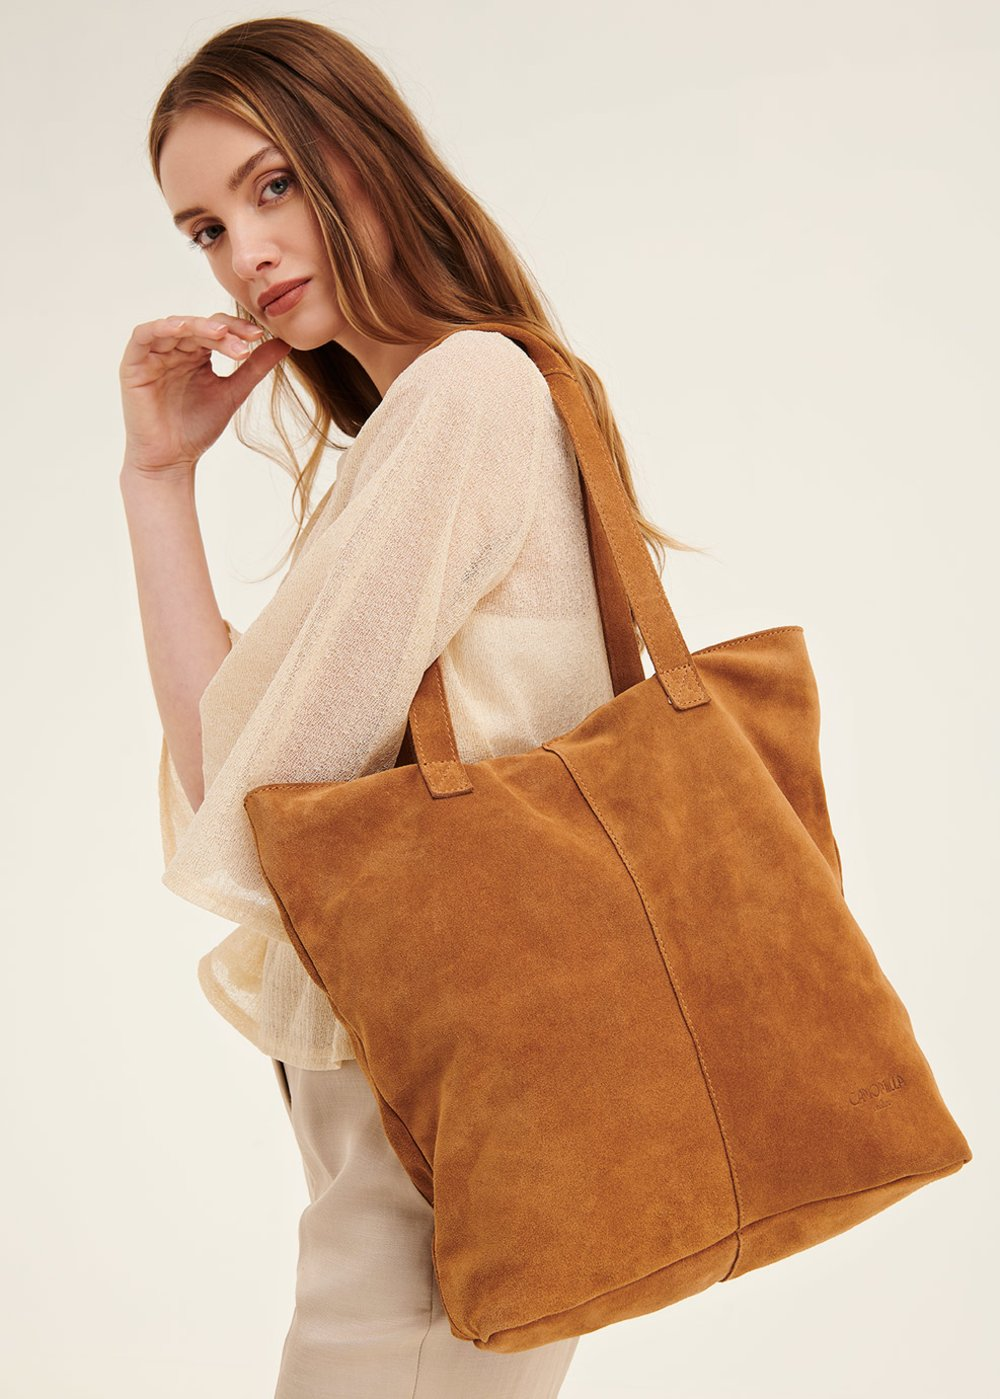 Brigit unlined genuine leather shopping bag - Pecan - Woman